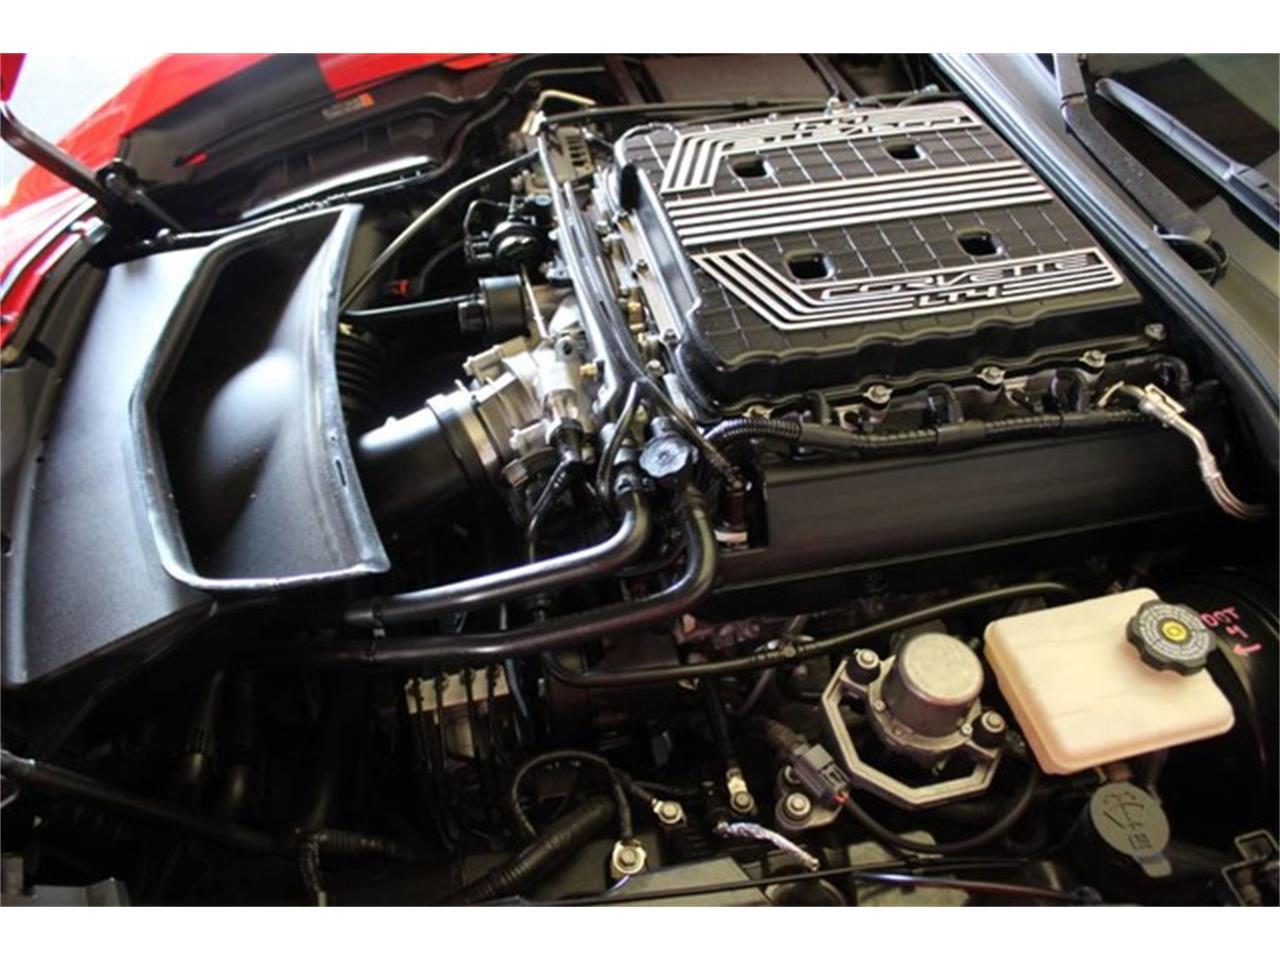 Large Picture of 2018 Chevrolet Corvette located in California - $72,700.00 - QET0